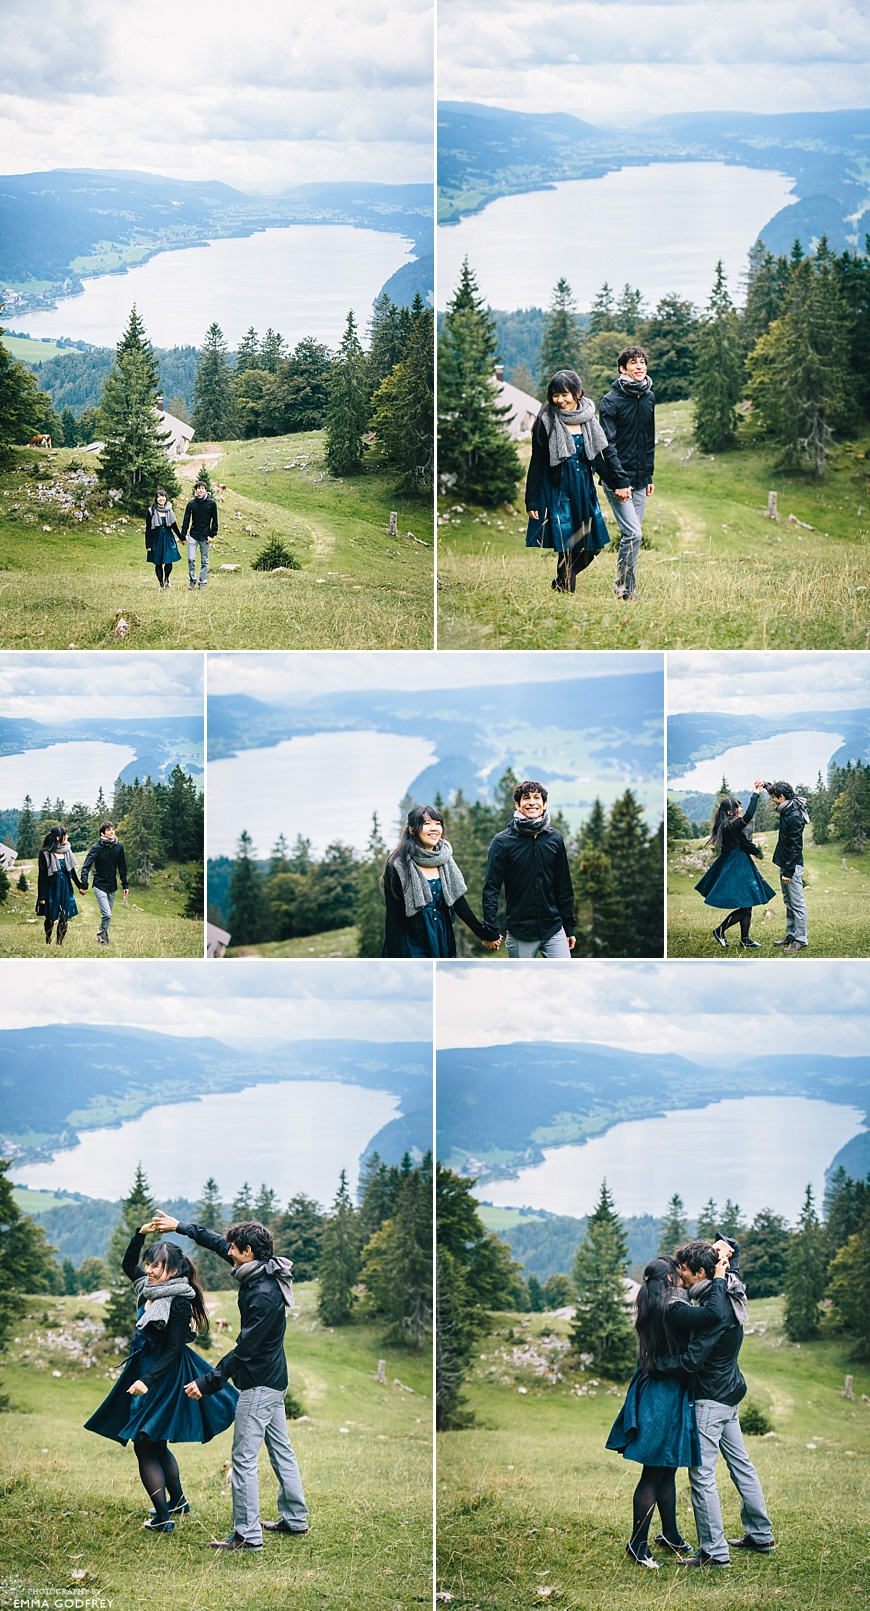 05-Mountain-top-engagement-shoot.jpg